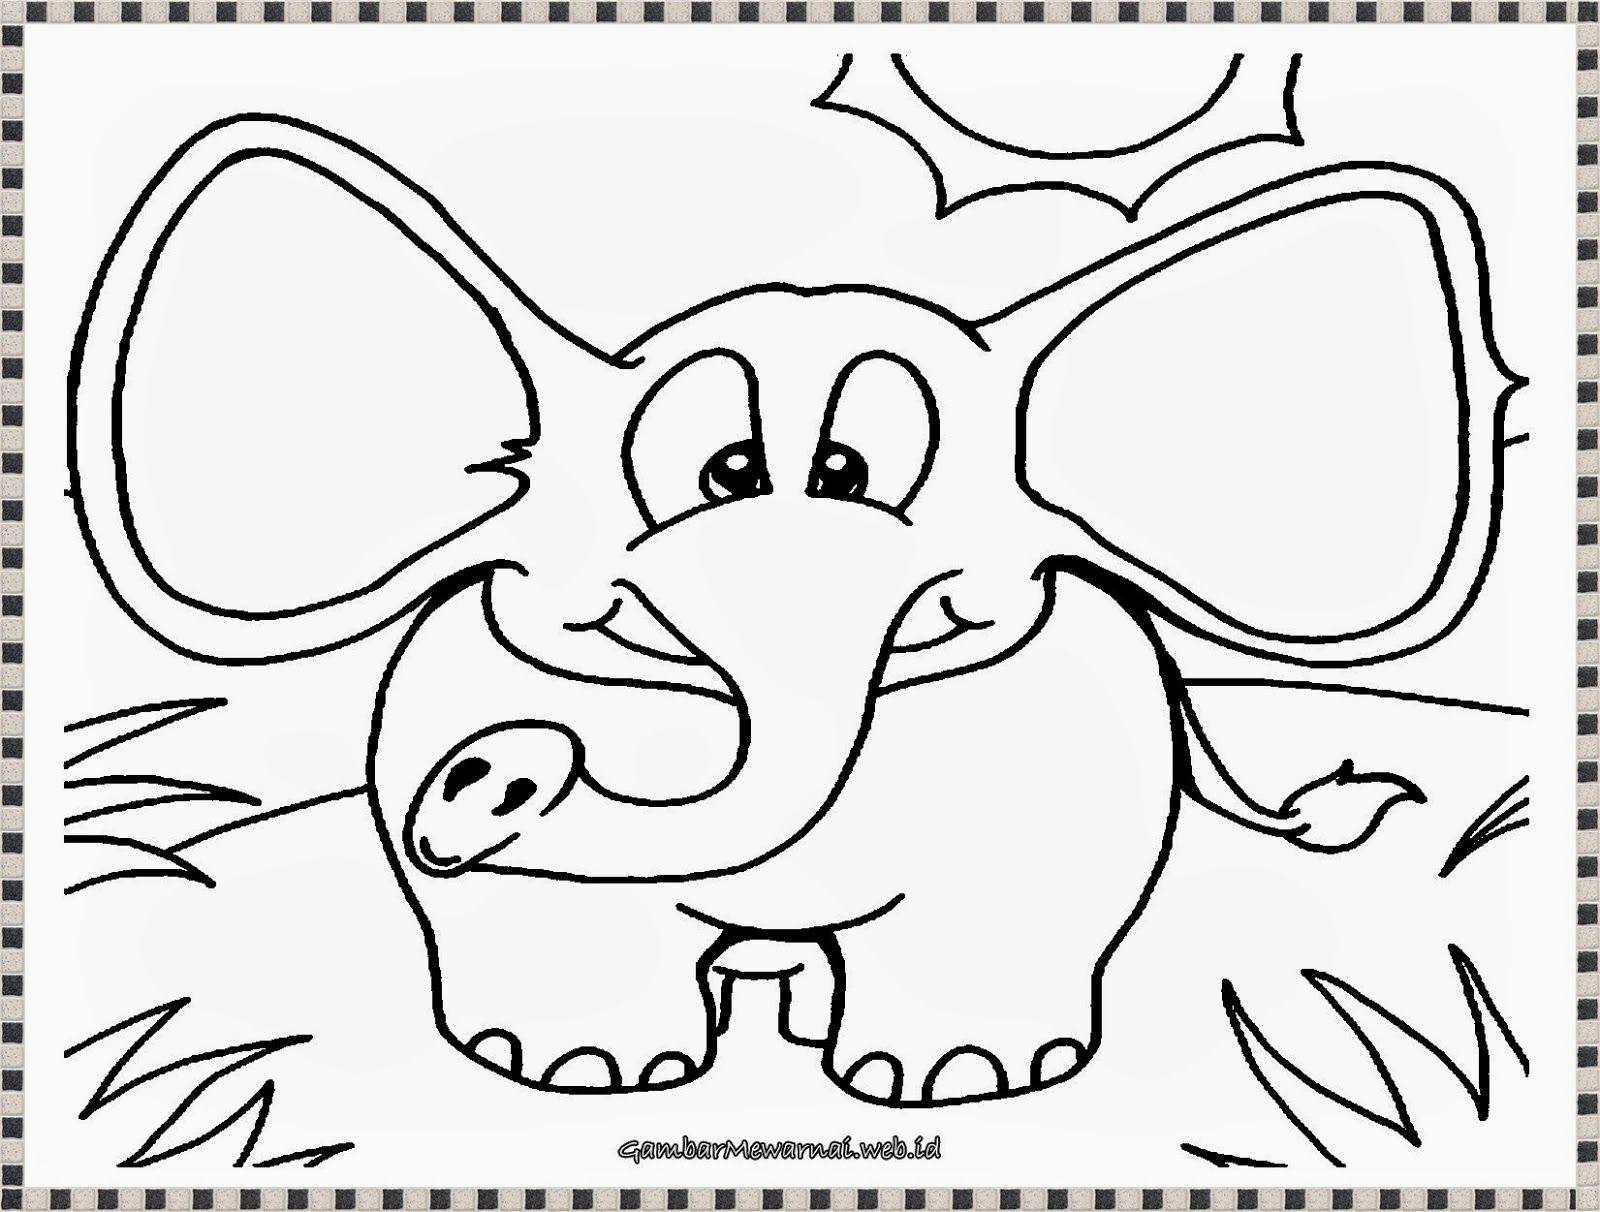 Gambar Mewarnai Anak Gajah Yang Lucu Gambar Mewarnai Pinterest